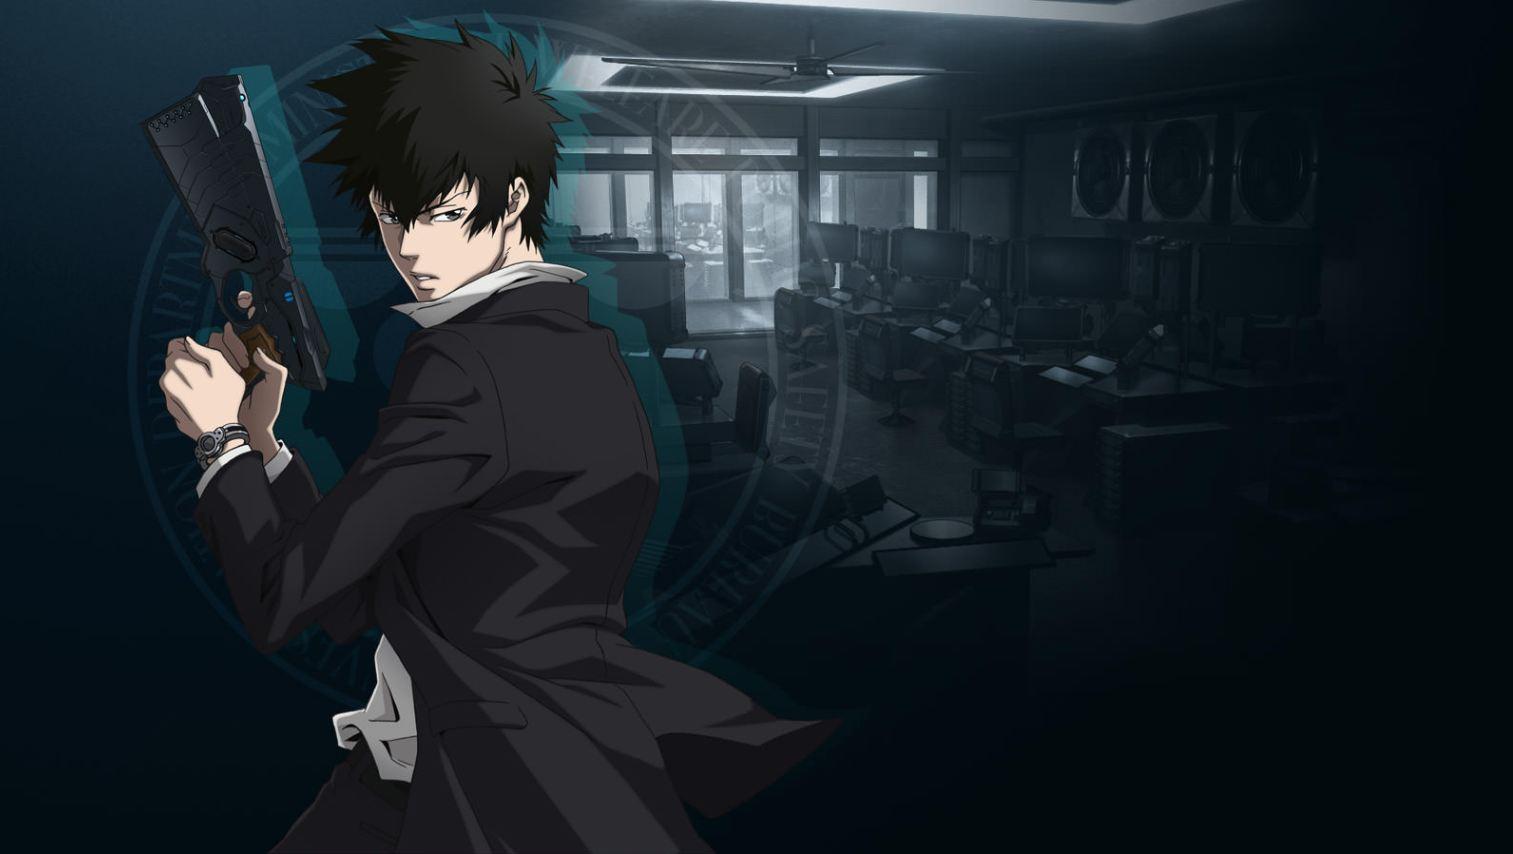 Visuel du personnage Kougami Shin'ya de Psycho-Pass